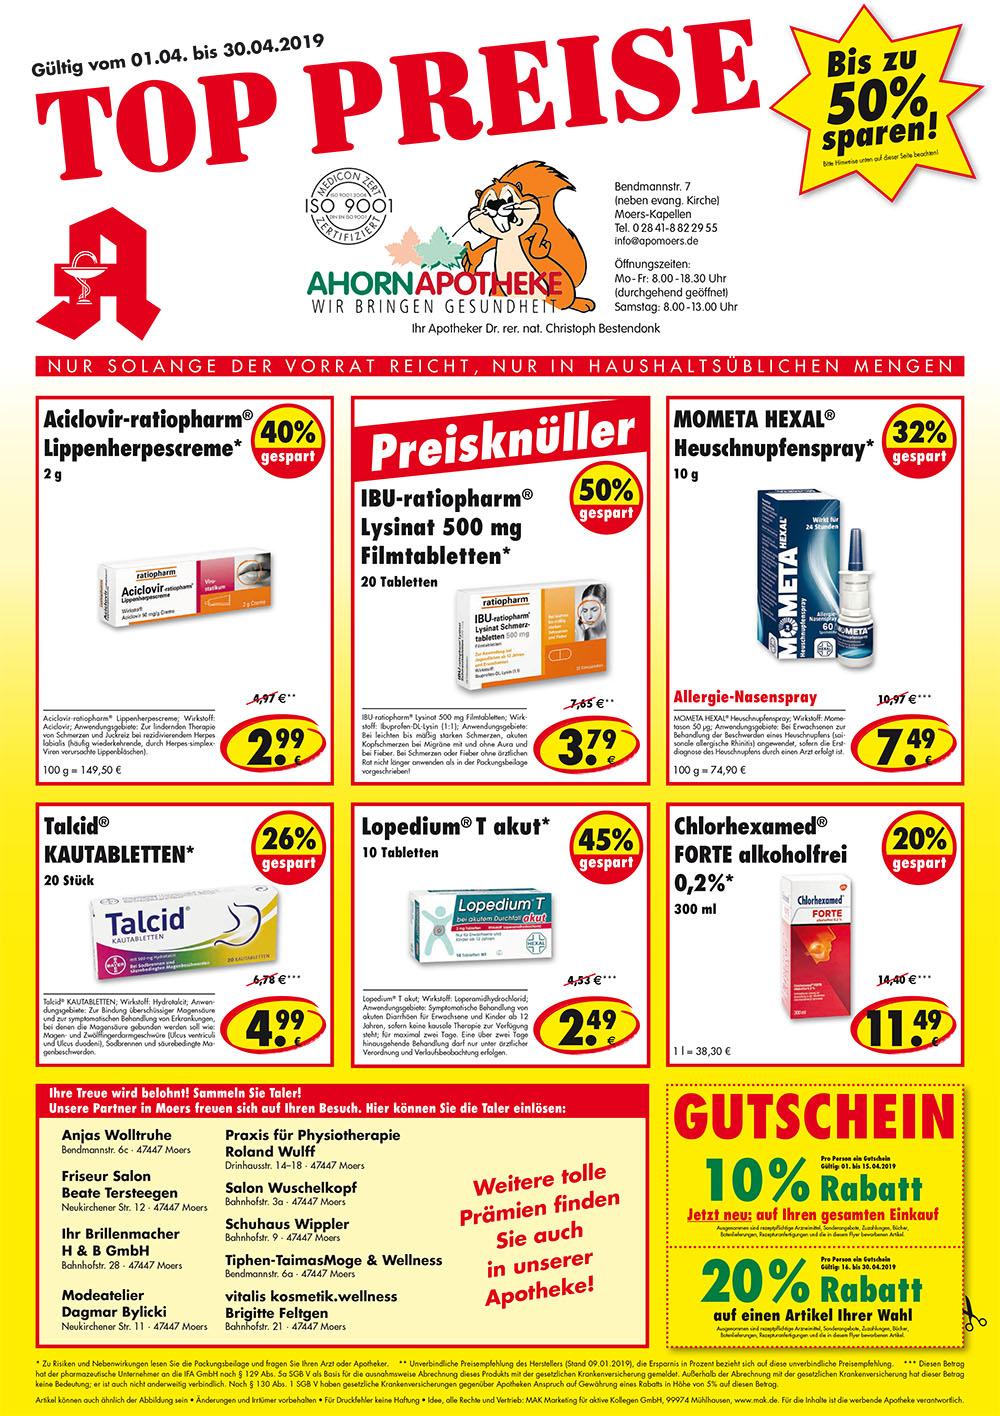 http://www.apotheken.de/fileadmin/clubarea/00000-Angebote/47447_13605_ahorn_angebot_1.jpg